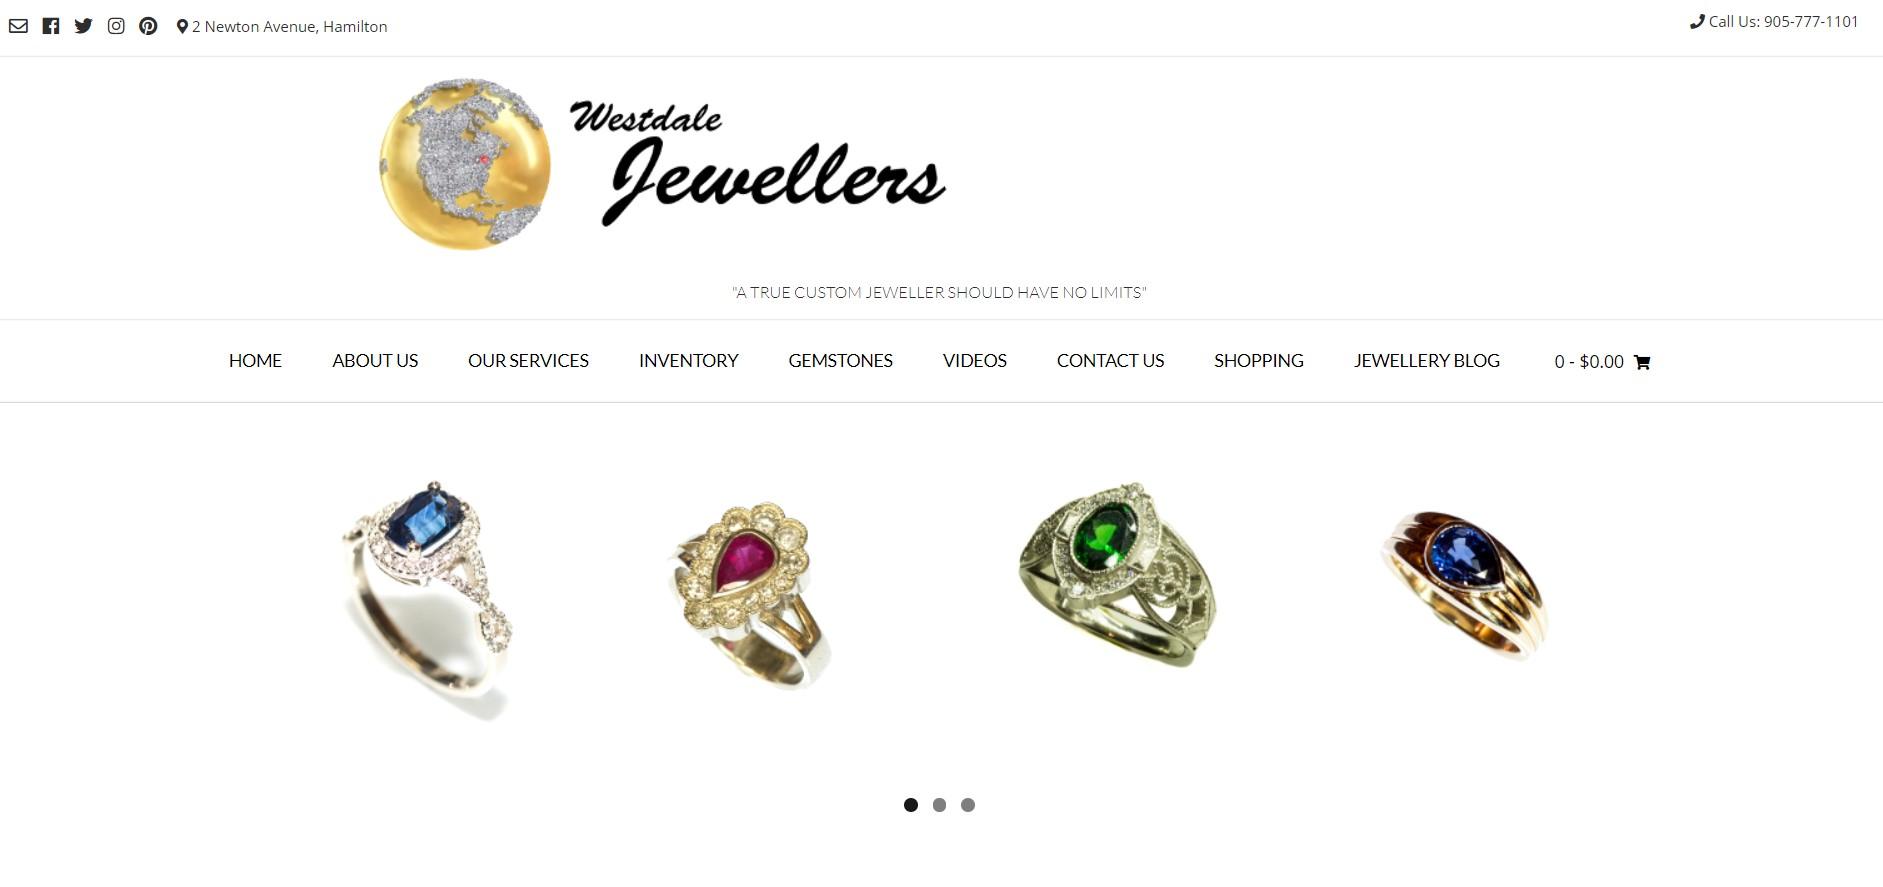 westdale jewelry store in hamilton